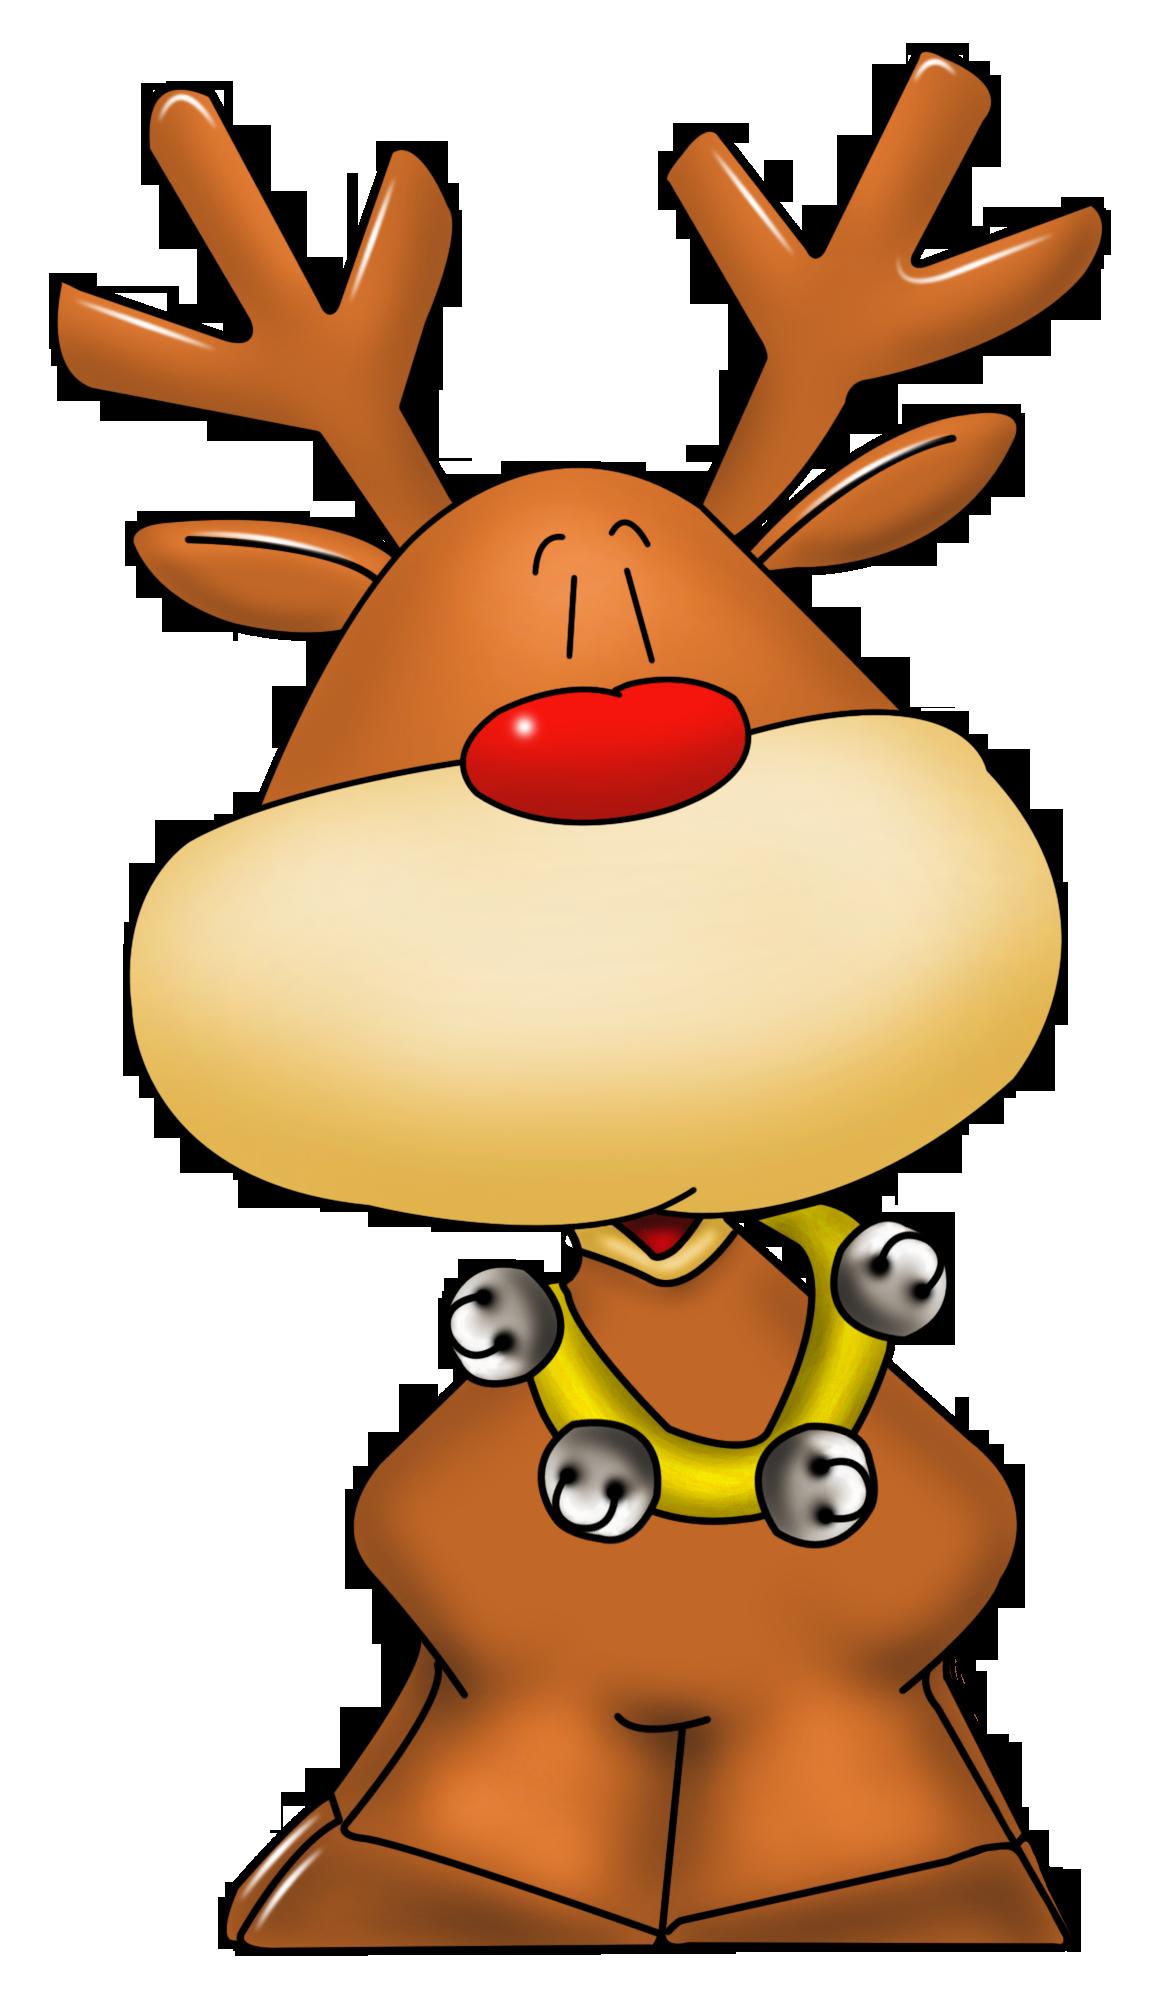 Cute Rudolph Reindeer Clipart - Clipart Suggest